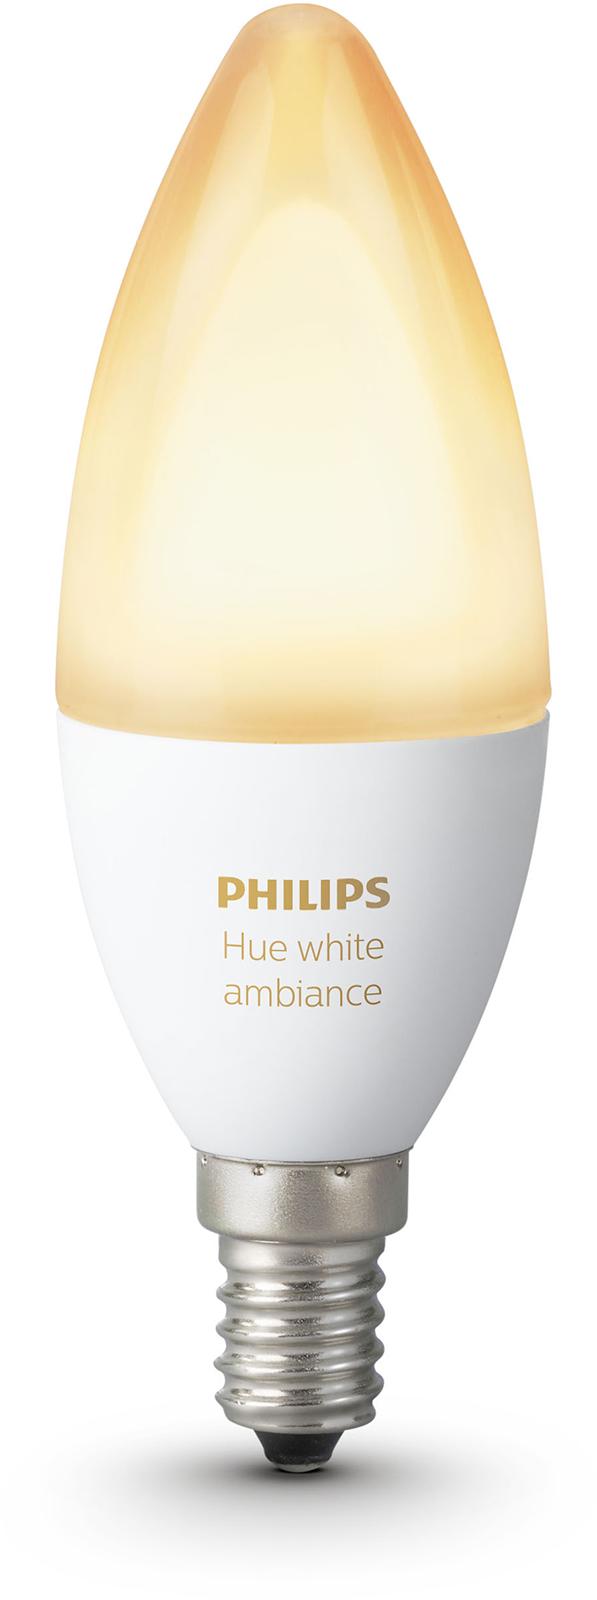 Philips Hue sfeerverlichting White Ambiance E14